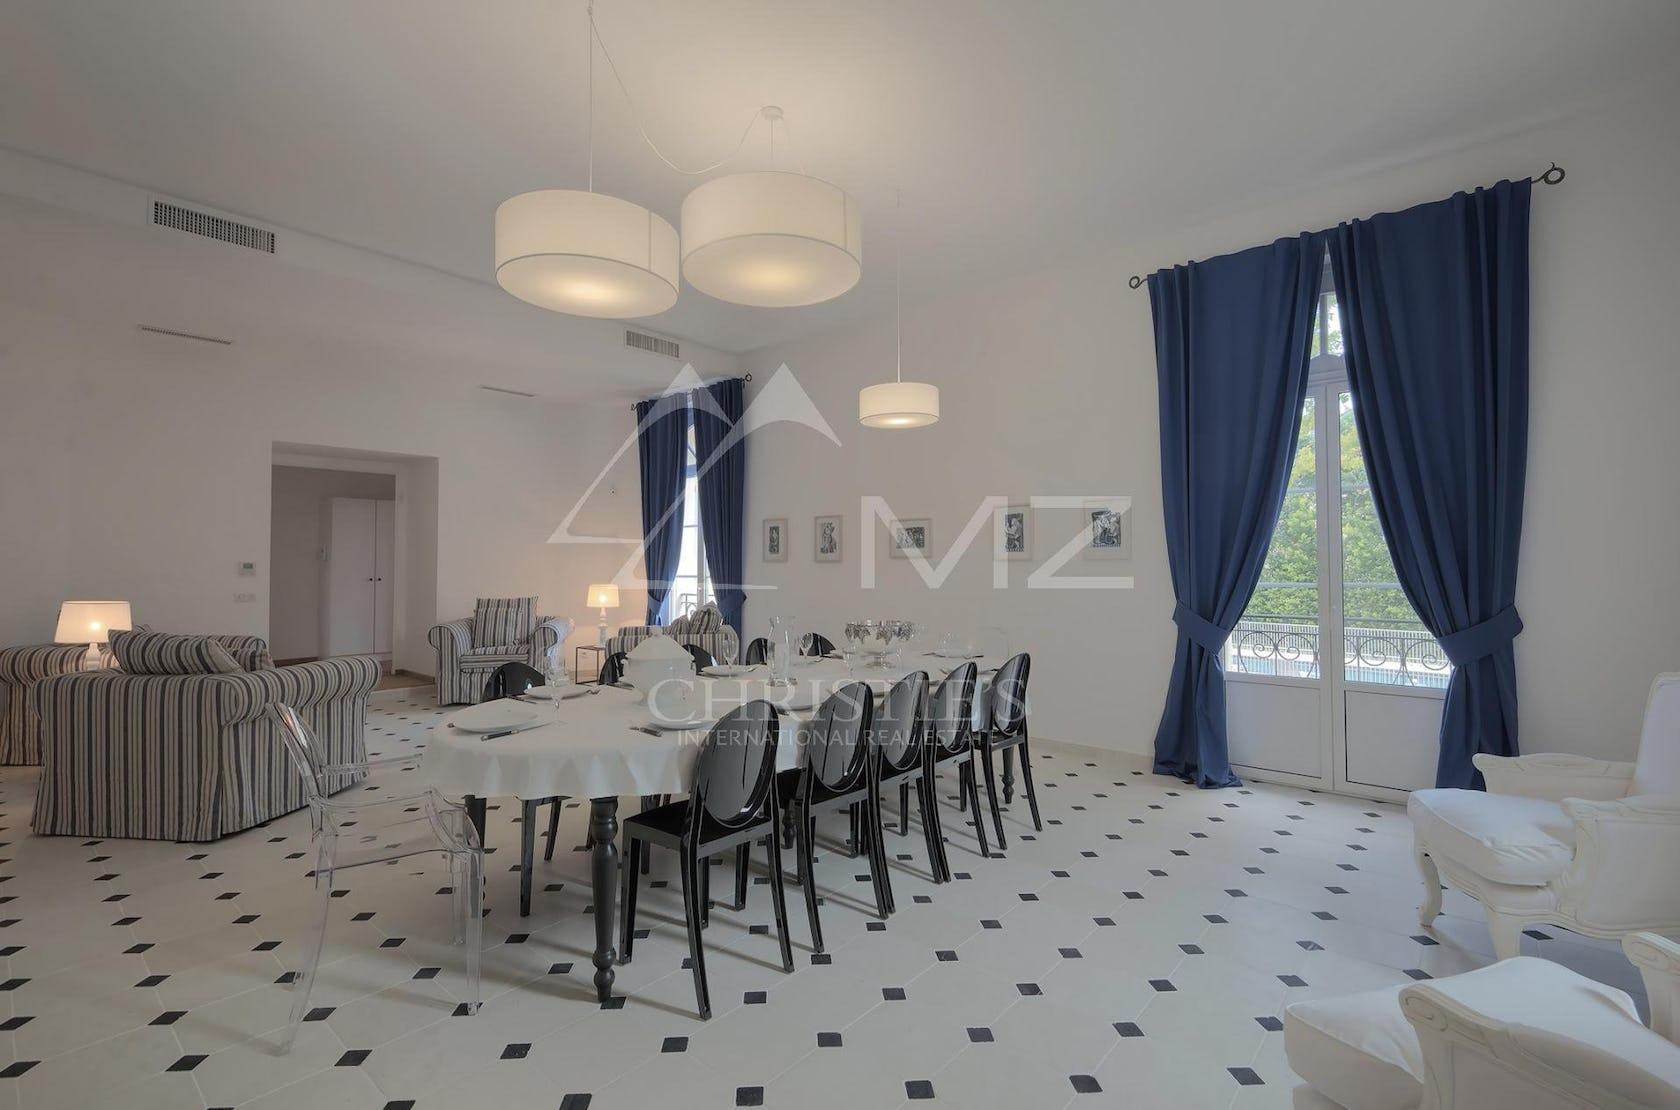 chair furniture indoors room flooring